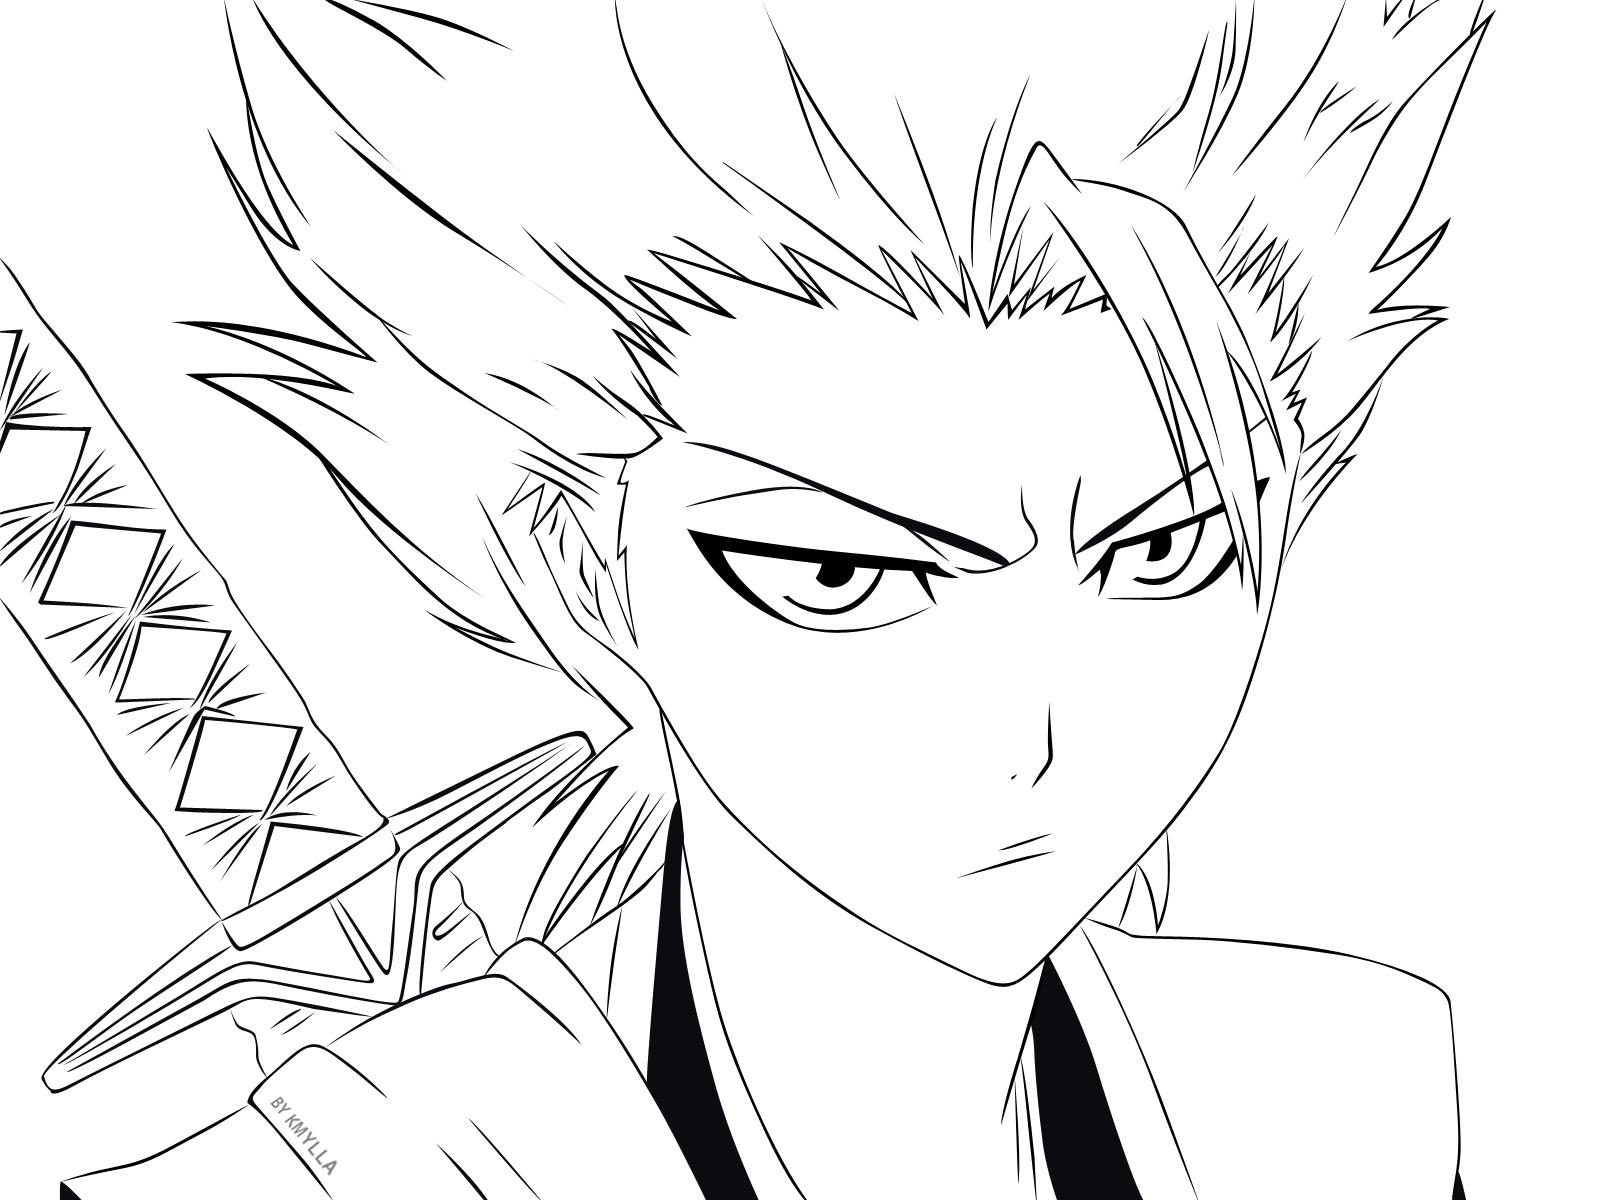 Line Art With Mr E : Vídeo lineart hitsugaya toushirou kmylla animes